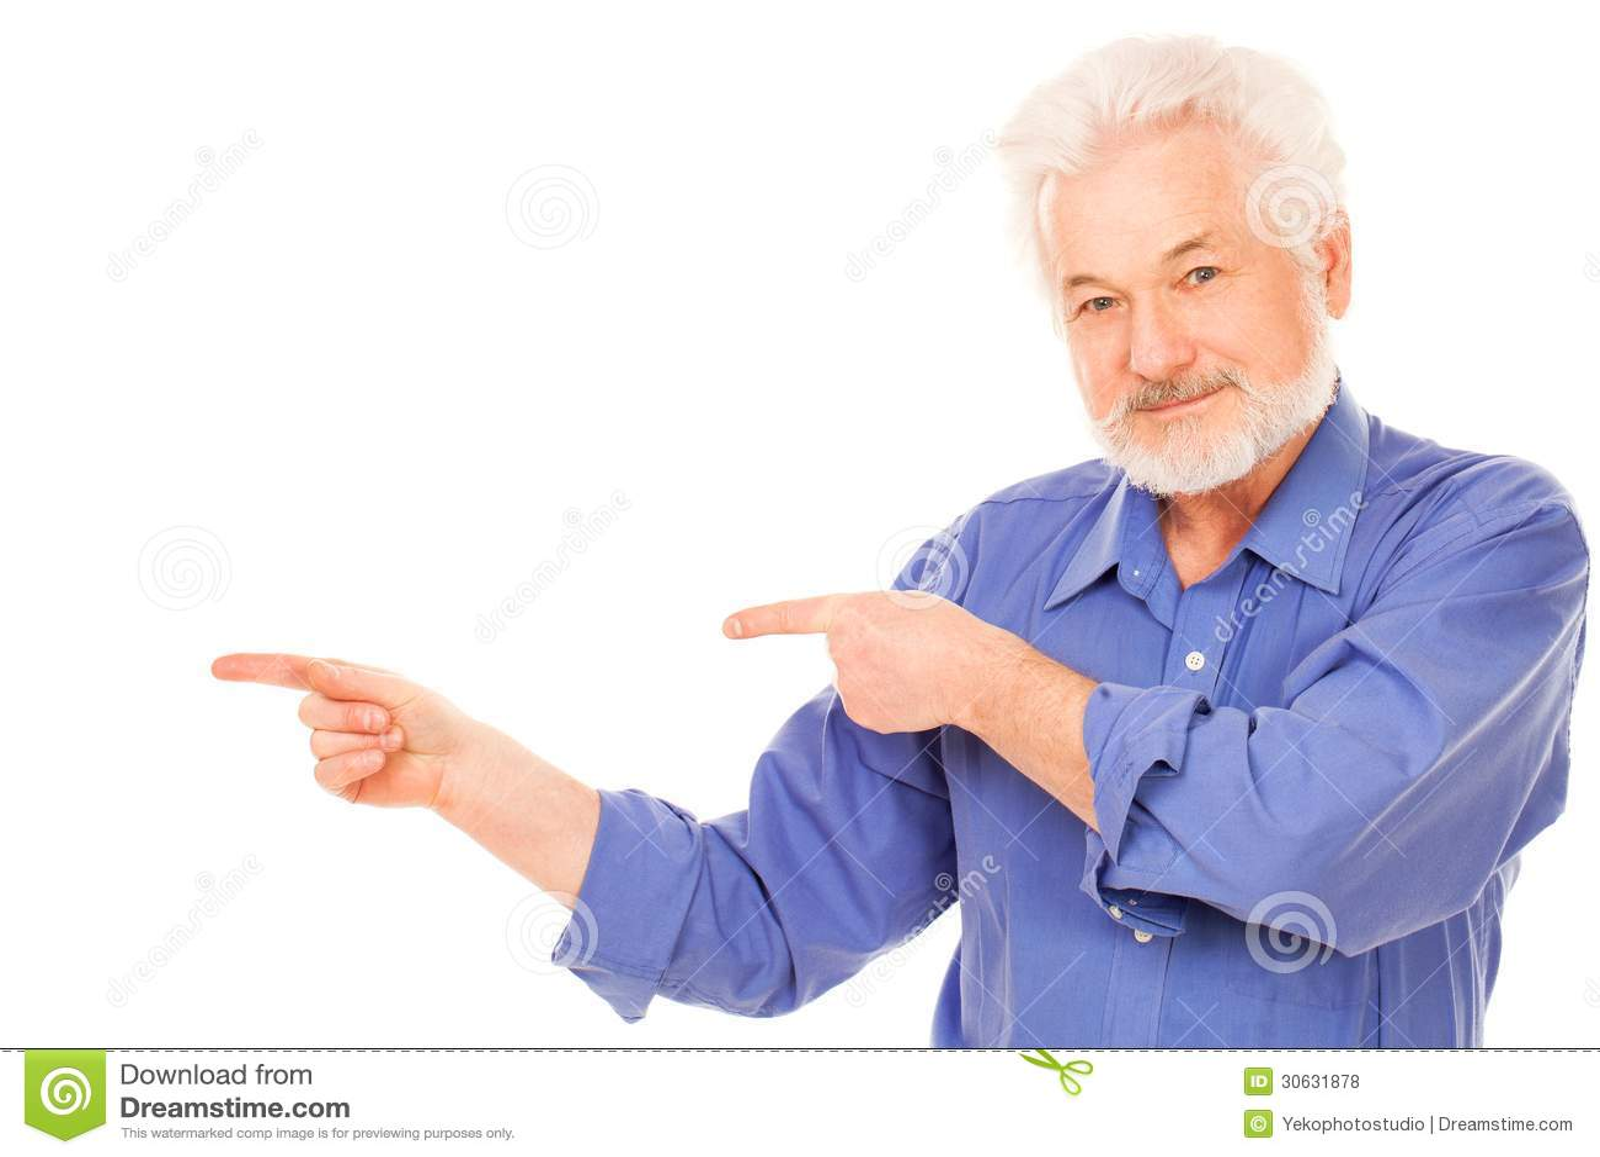 Happy Elderly Man With Beard Royalty Free Stock Photos - Image ...